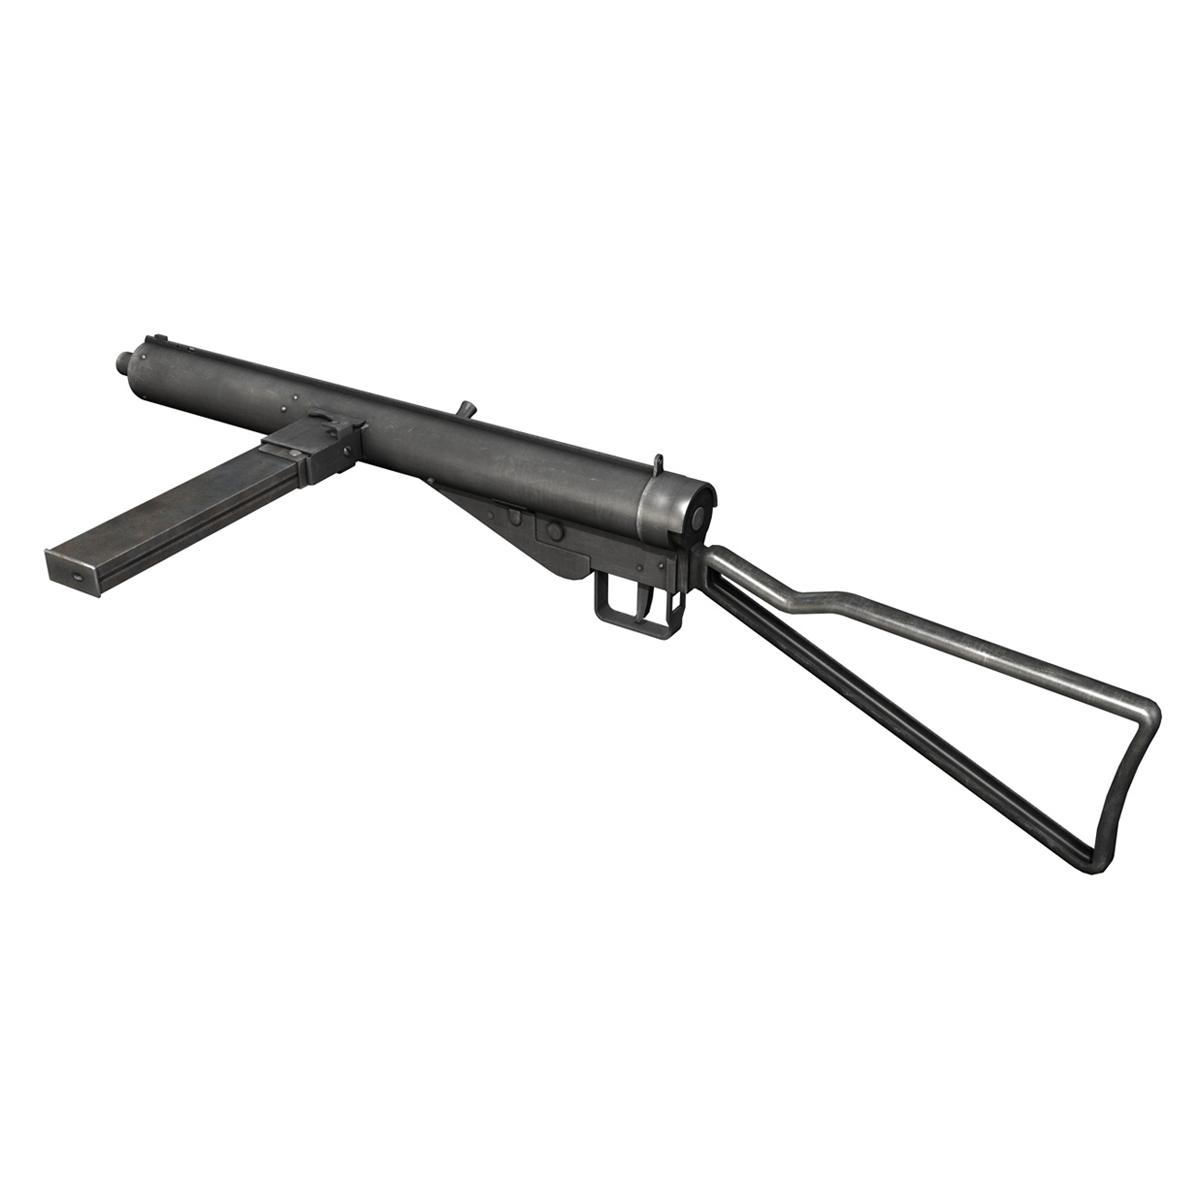 sten mk.iii submachine gun 3d model 3ds fbx c4d lwo obj 195113